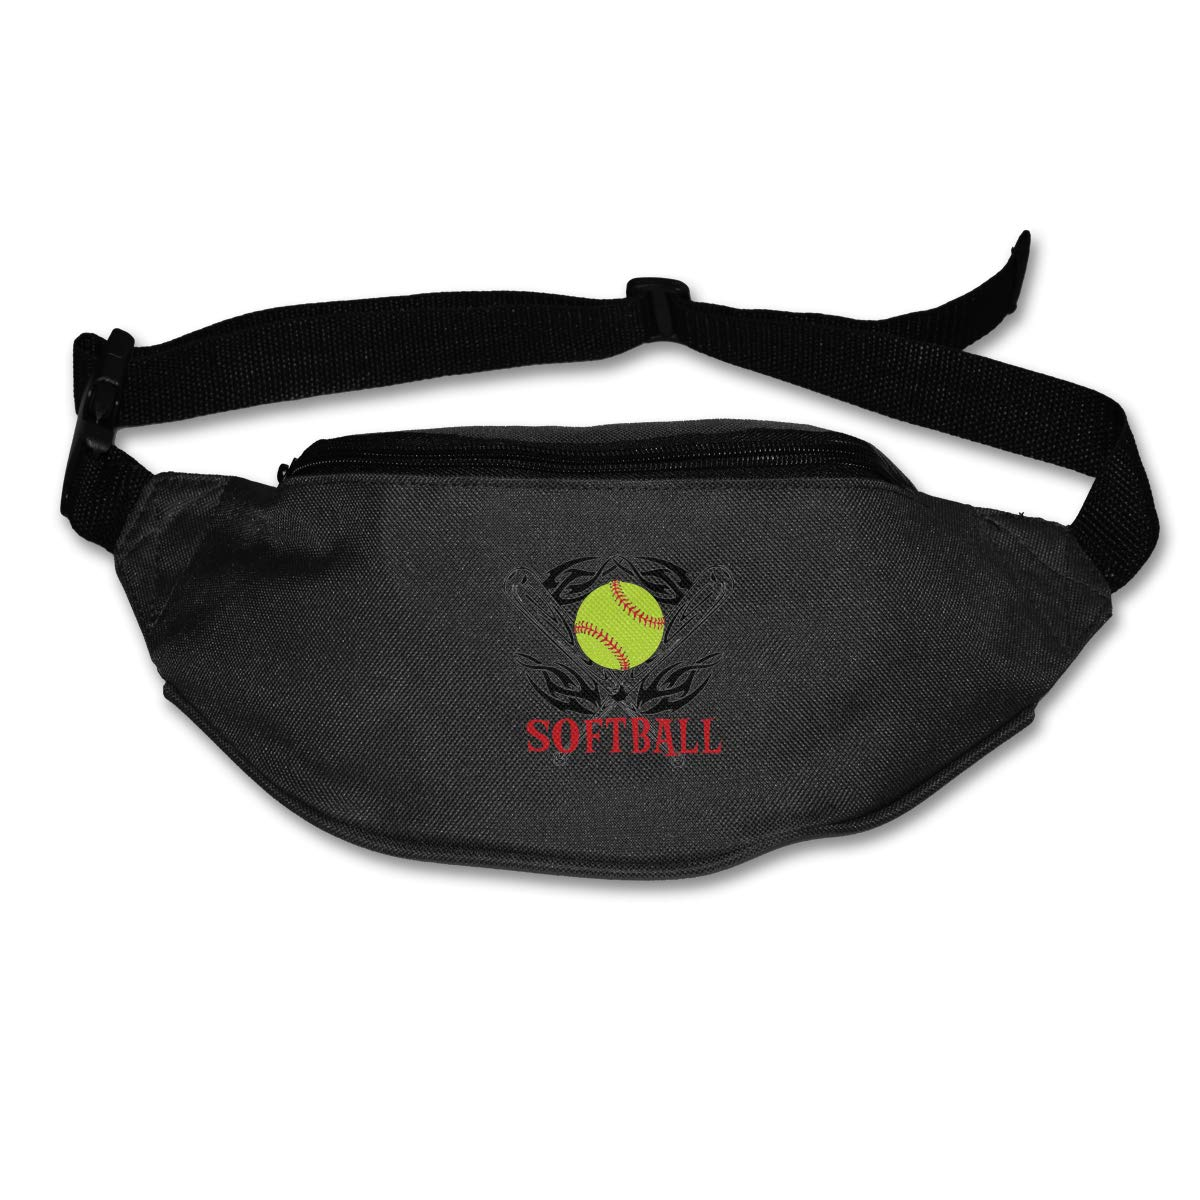 Fire Softball Sport Waist Pack Fanny Pack Adjustable For Travel